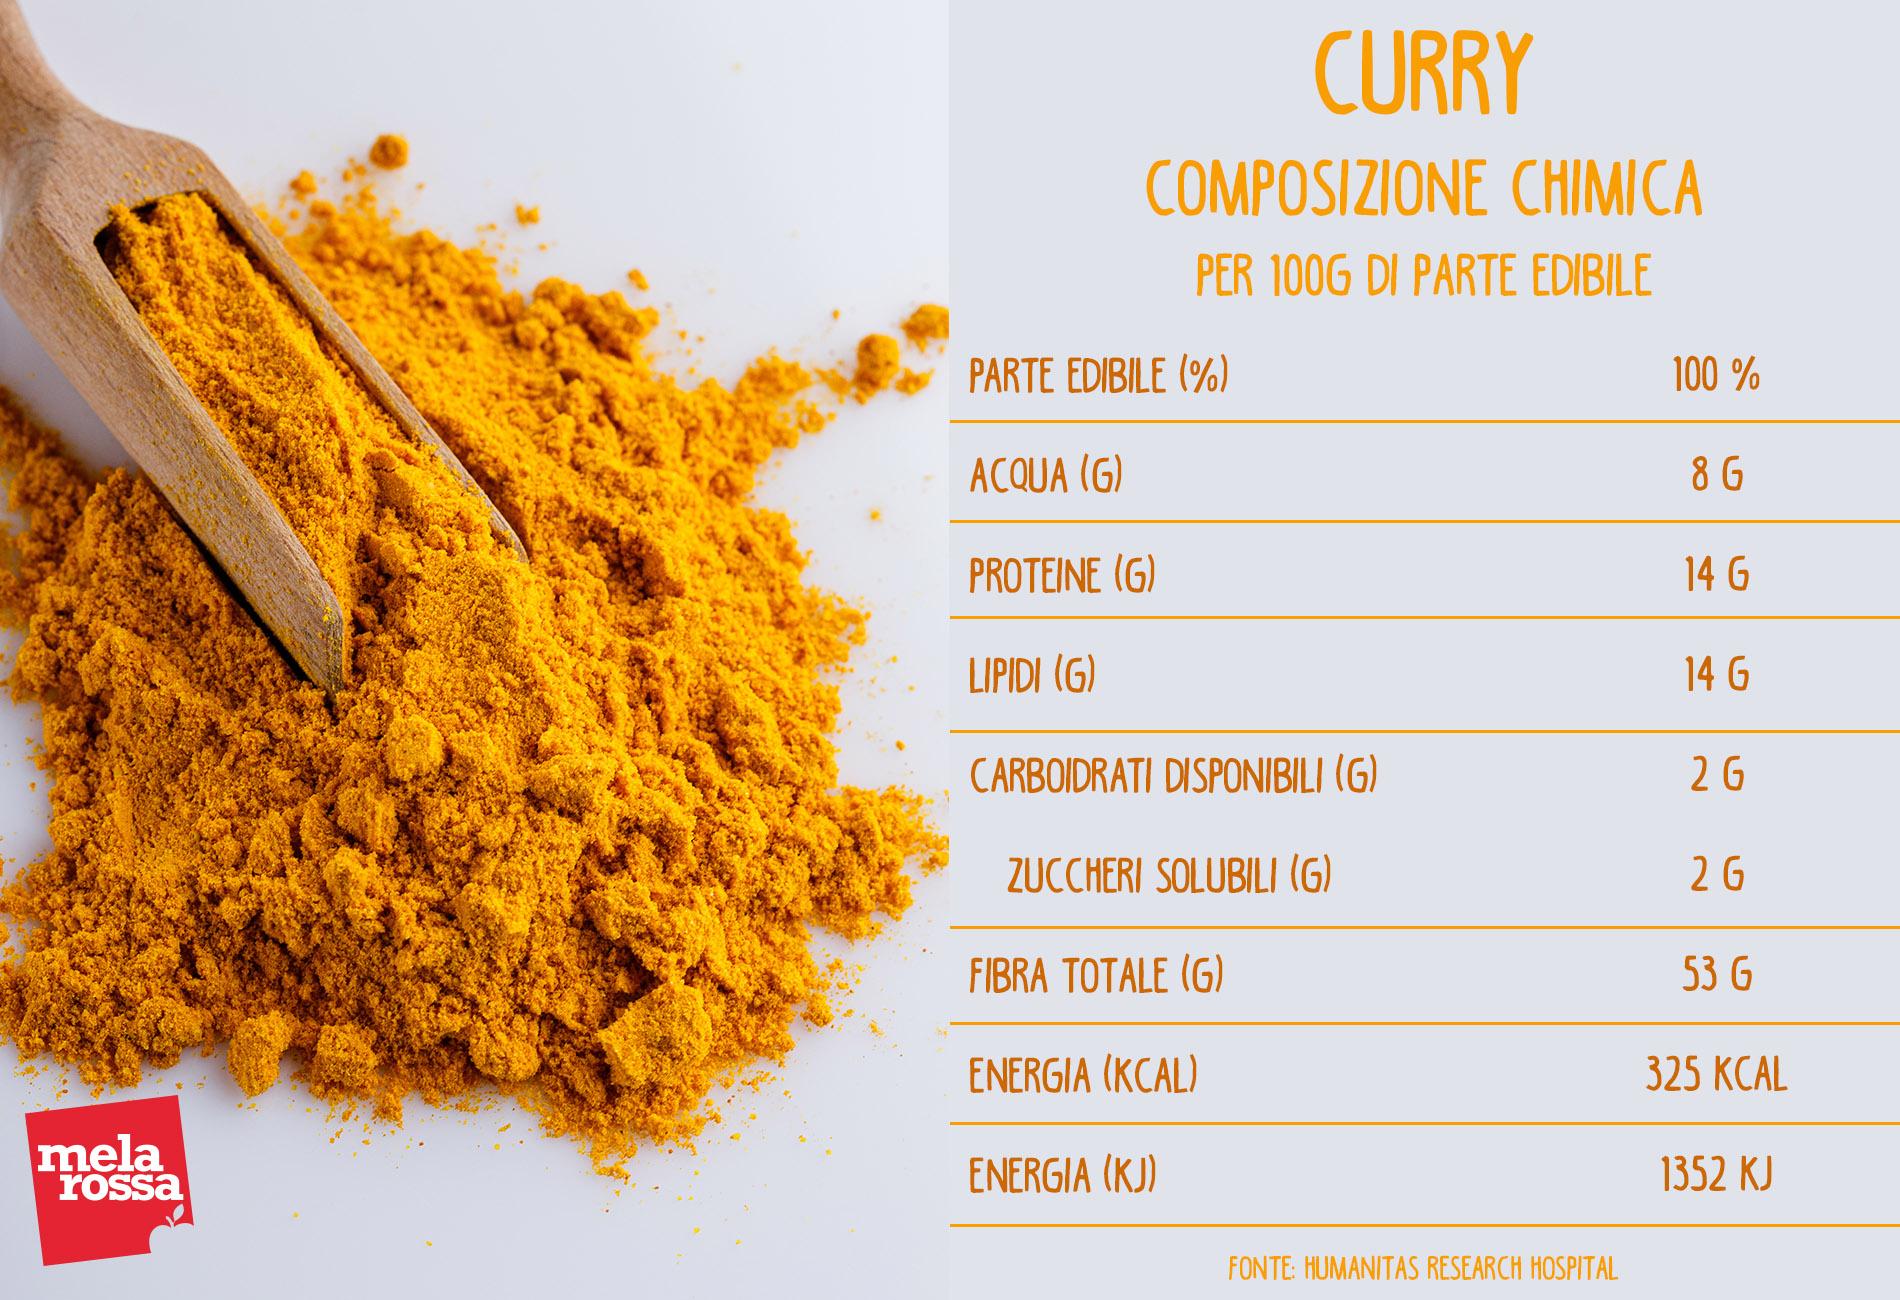 curry: composizione chimica